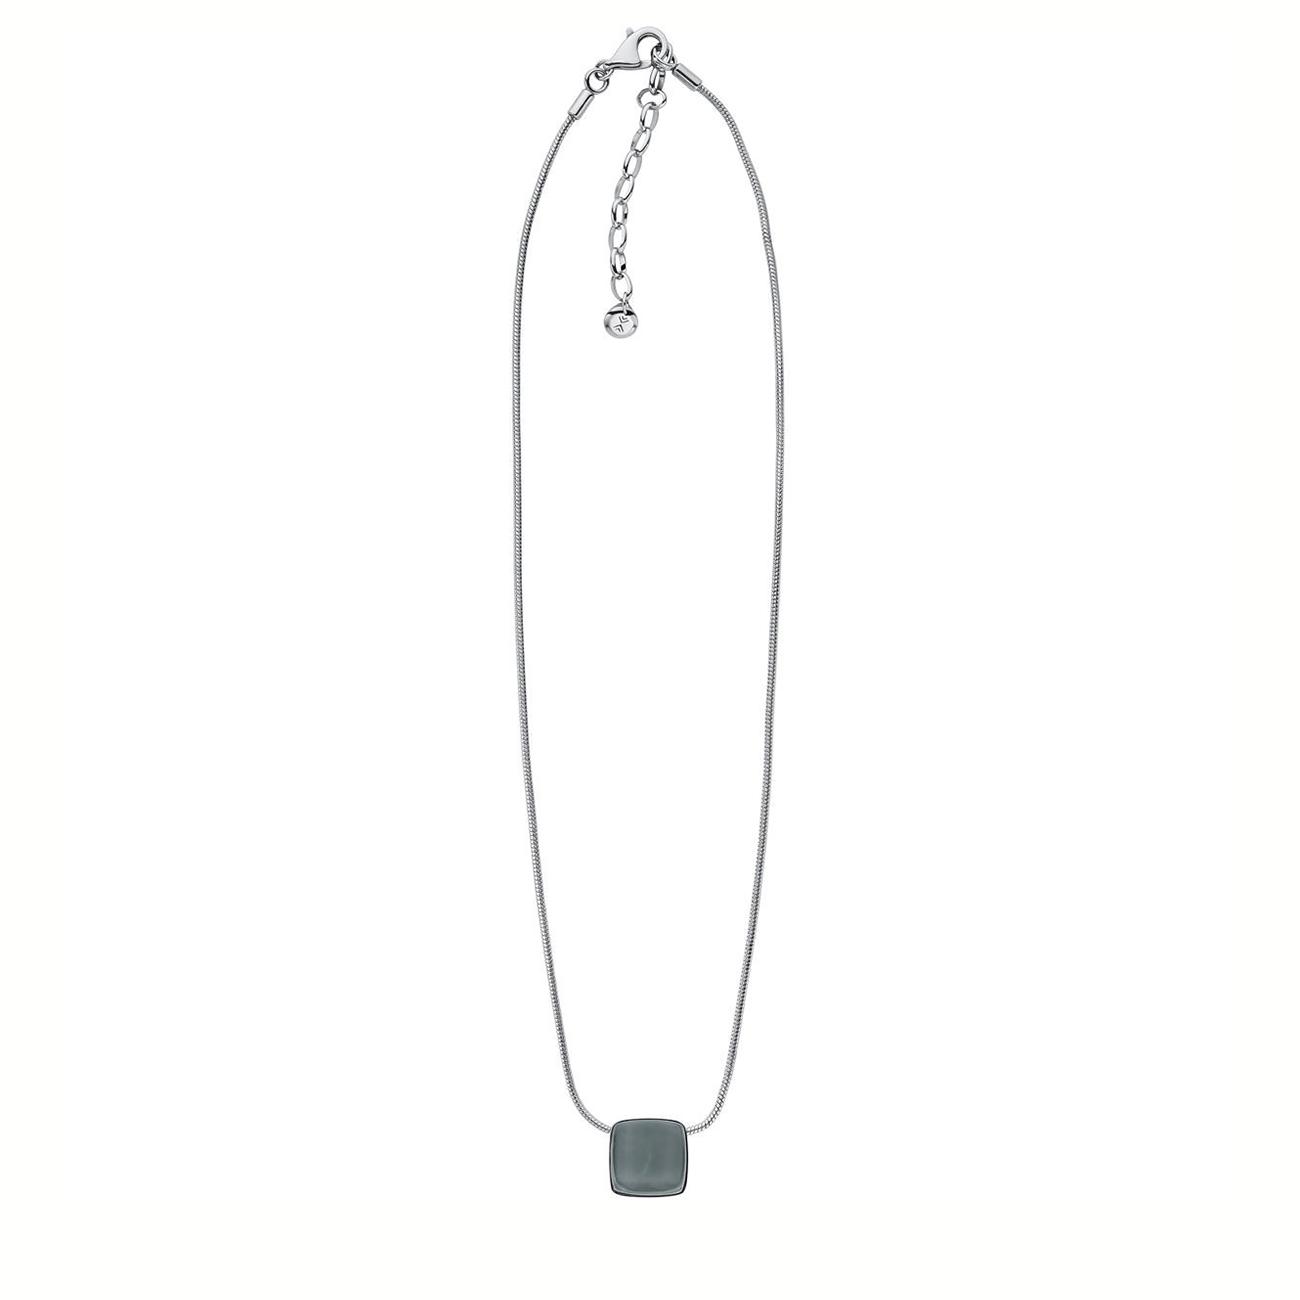 SKJ0868040 SEA GLASS NECKLACE imagine produs